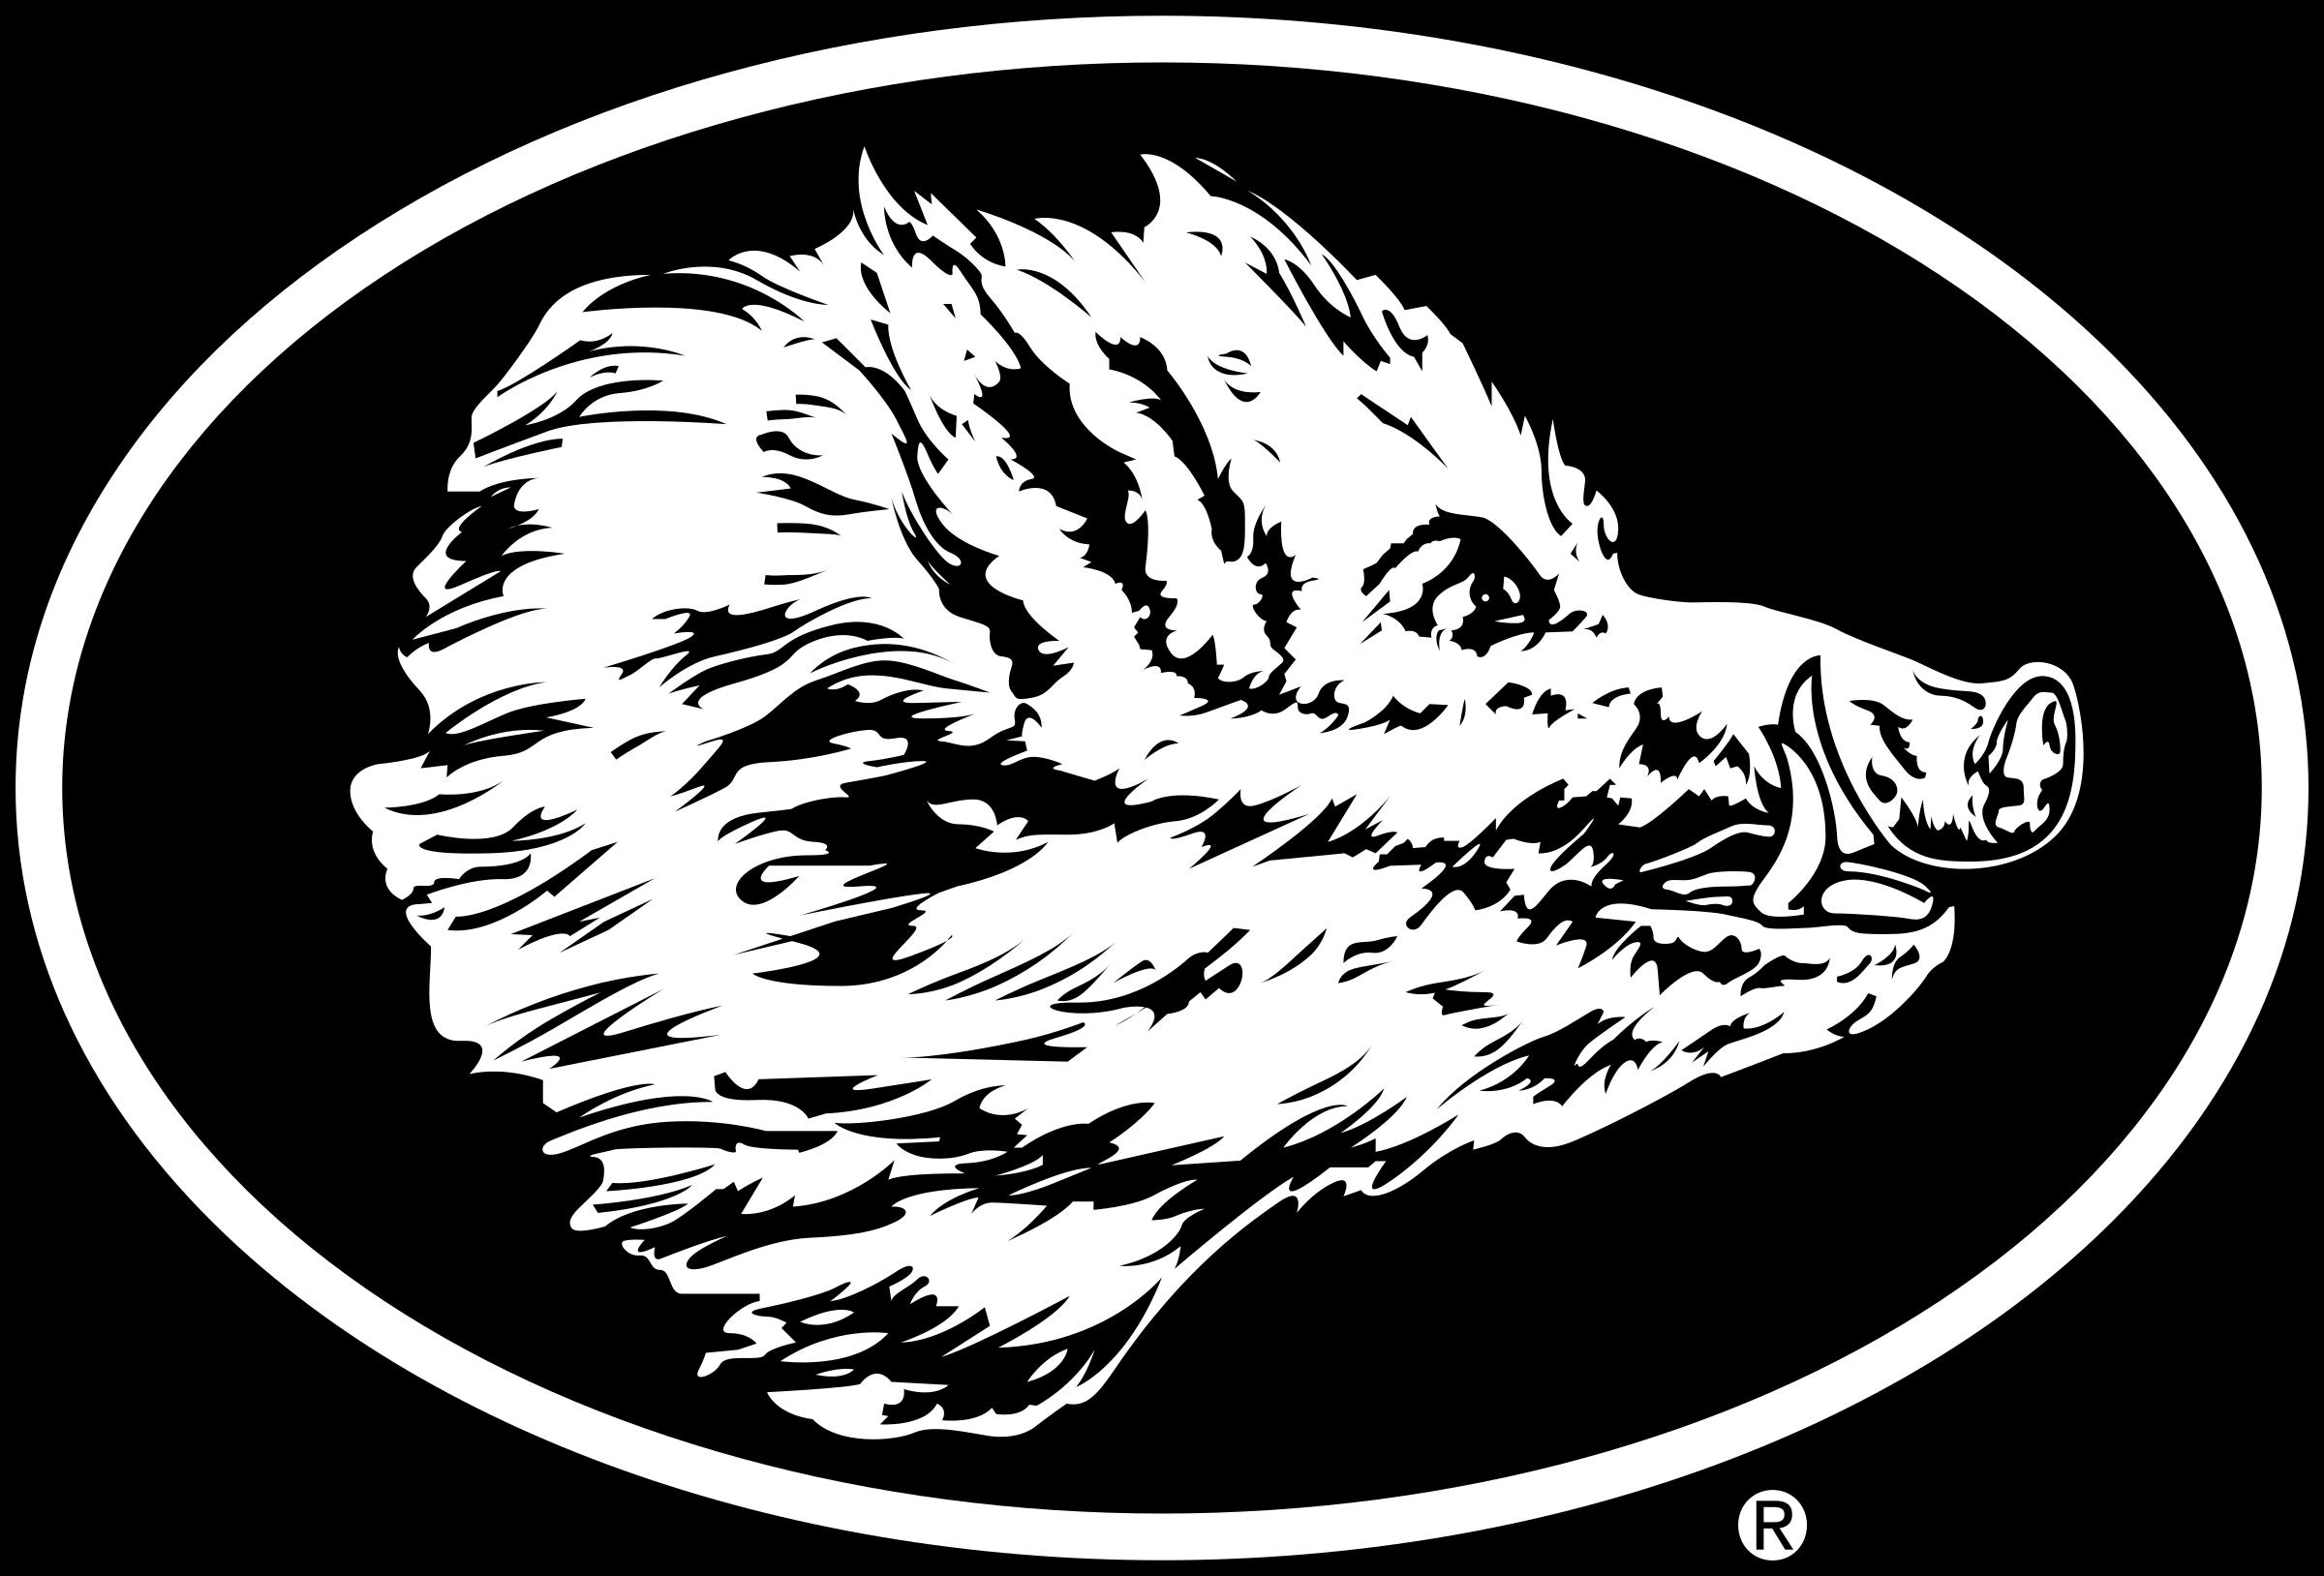 Hedgehog clipart svg. Boars head logo png